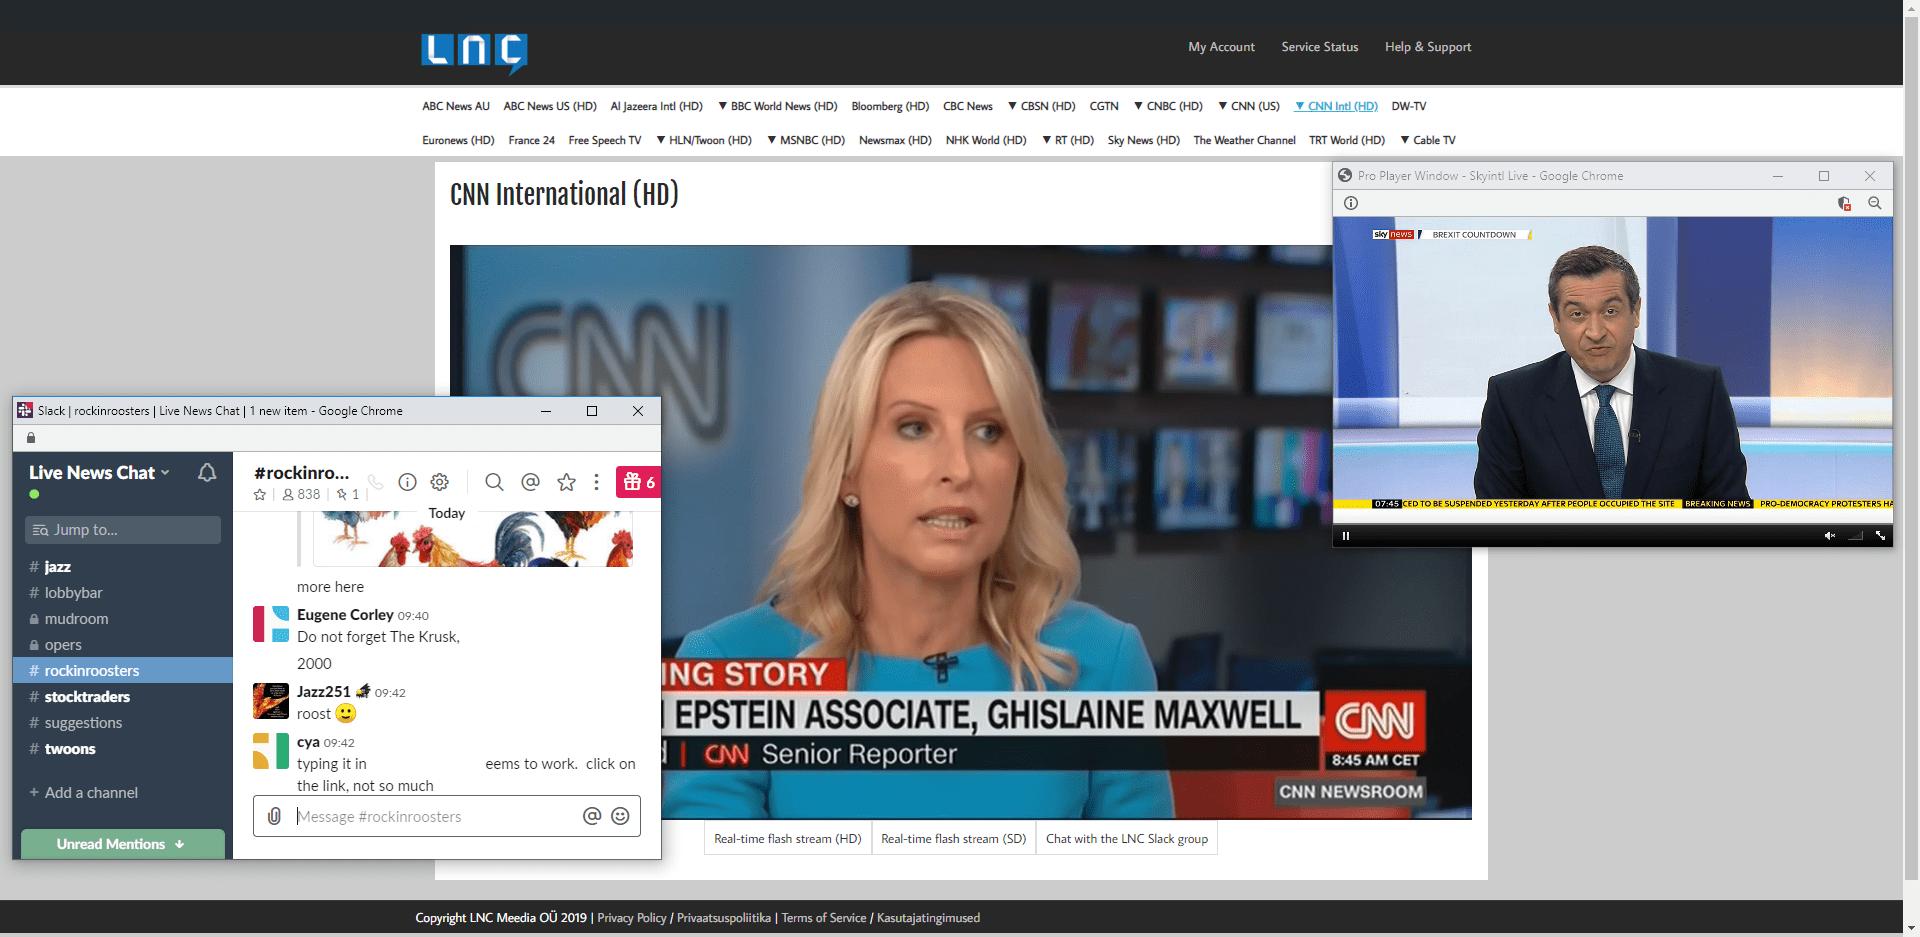 msnbc cnn cnbc bloomberg weather channel sky news cbc news al jazeera